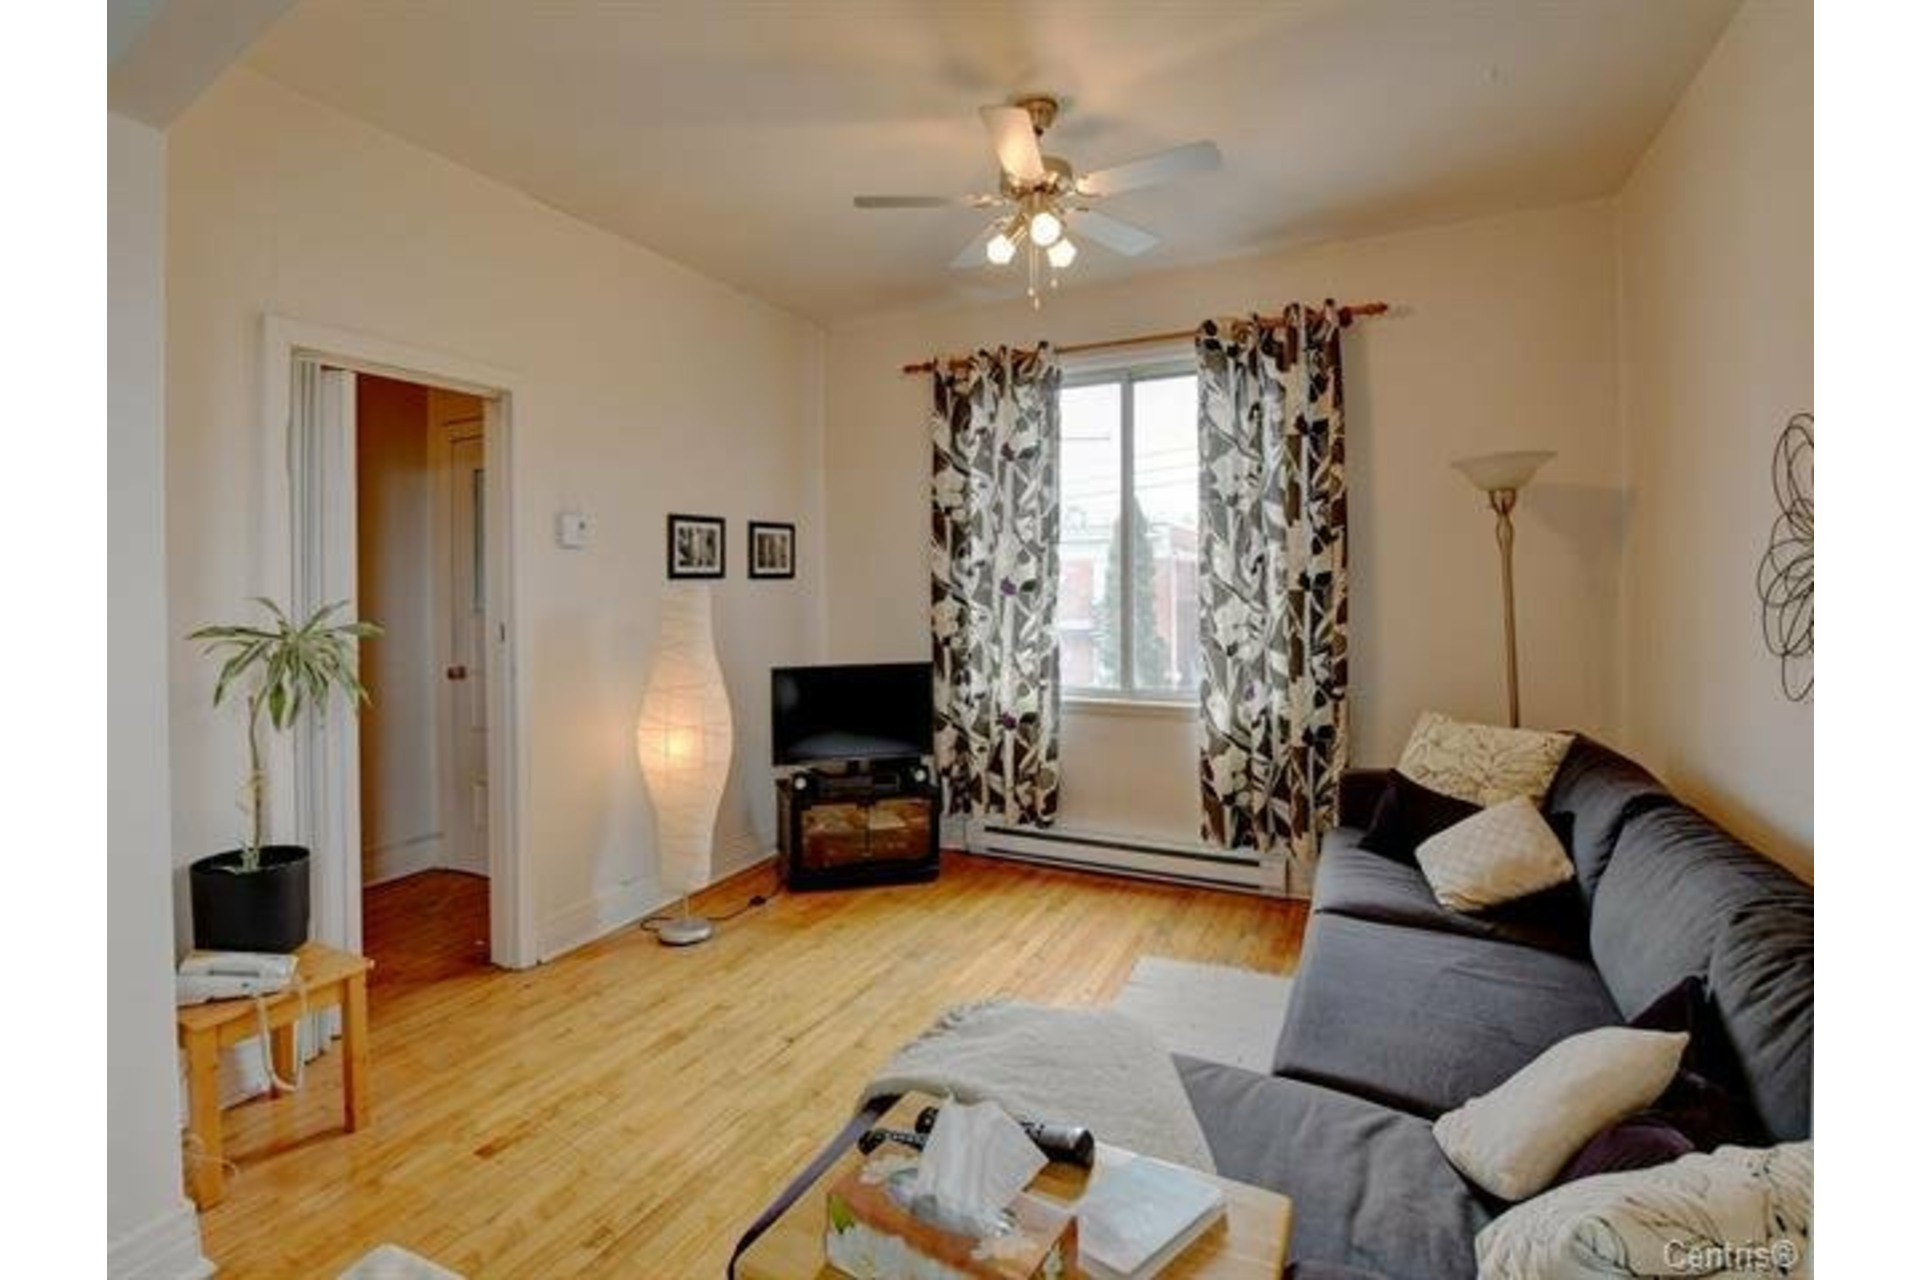 image 33 - Duplex En venta Lachine Montréal  - 6 habitaciones